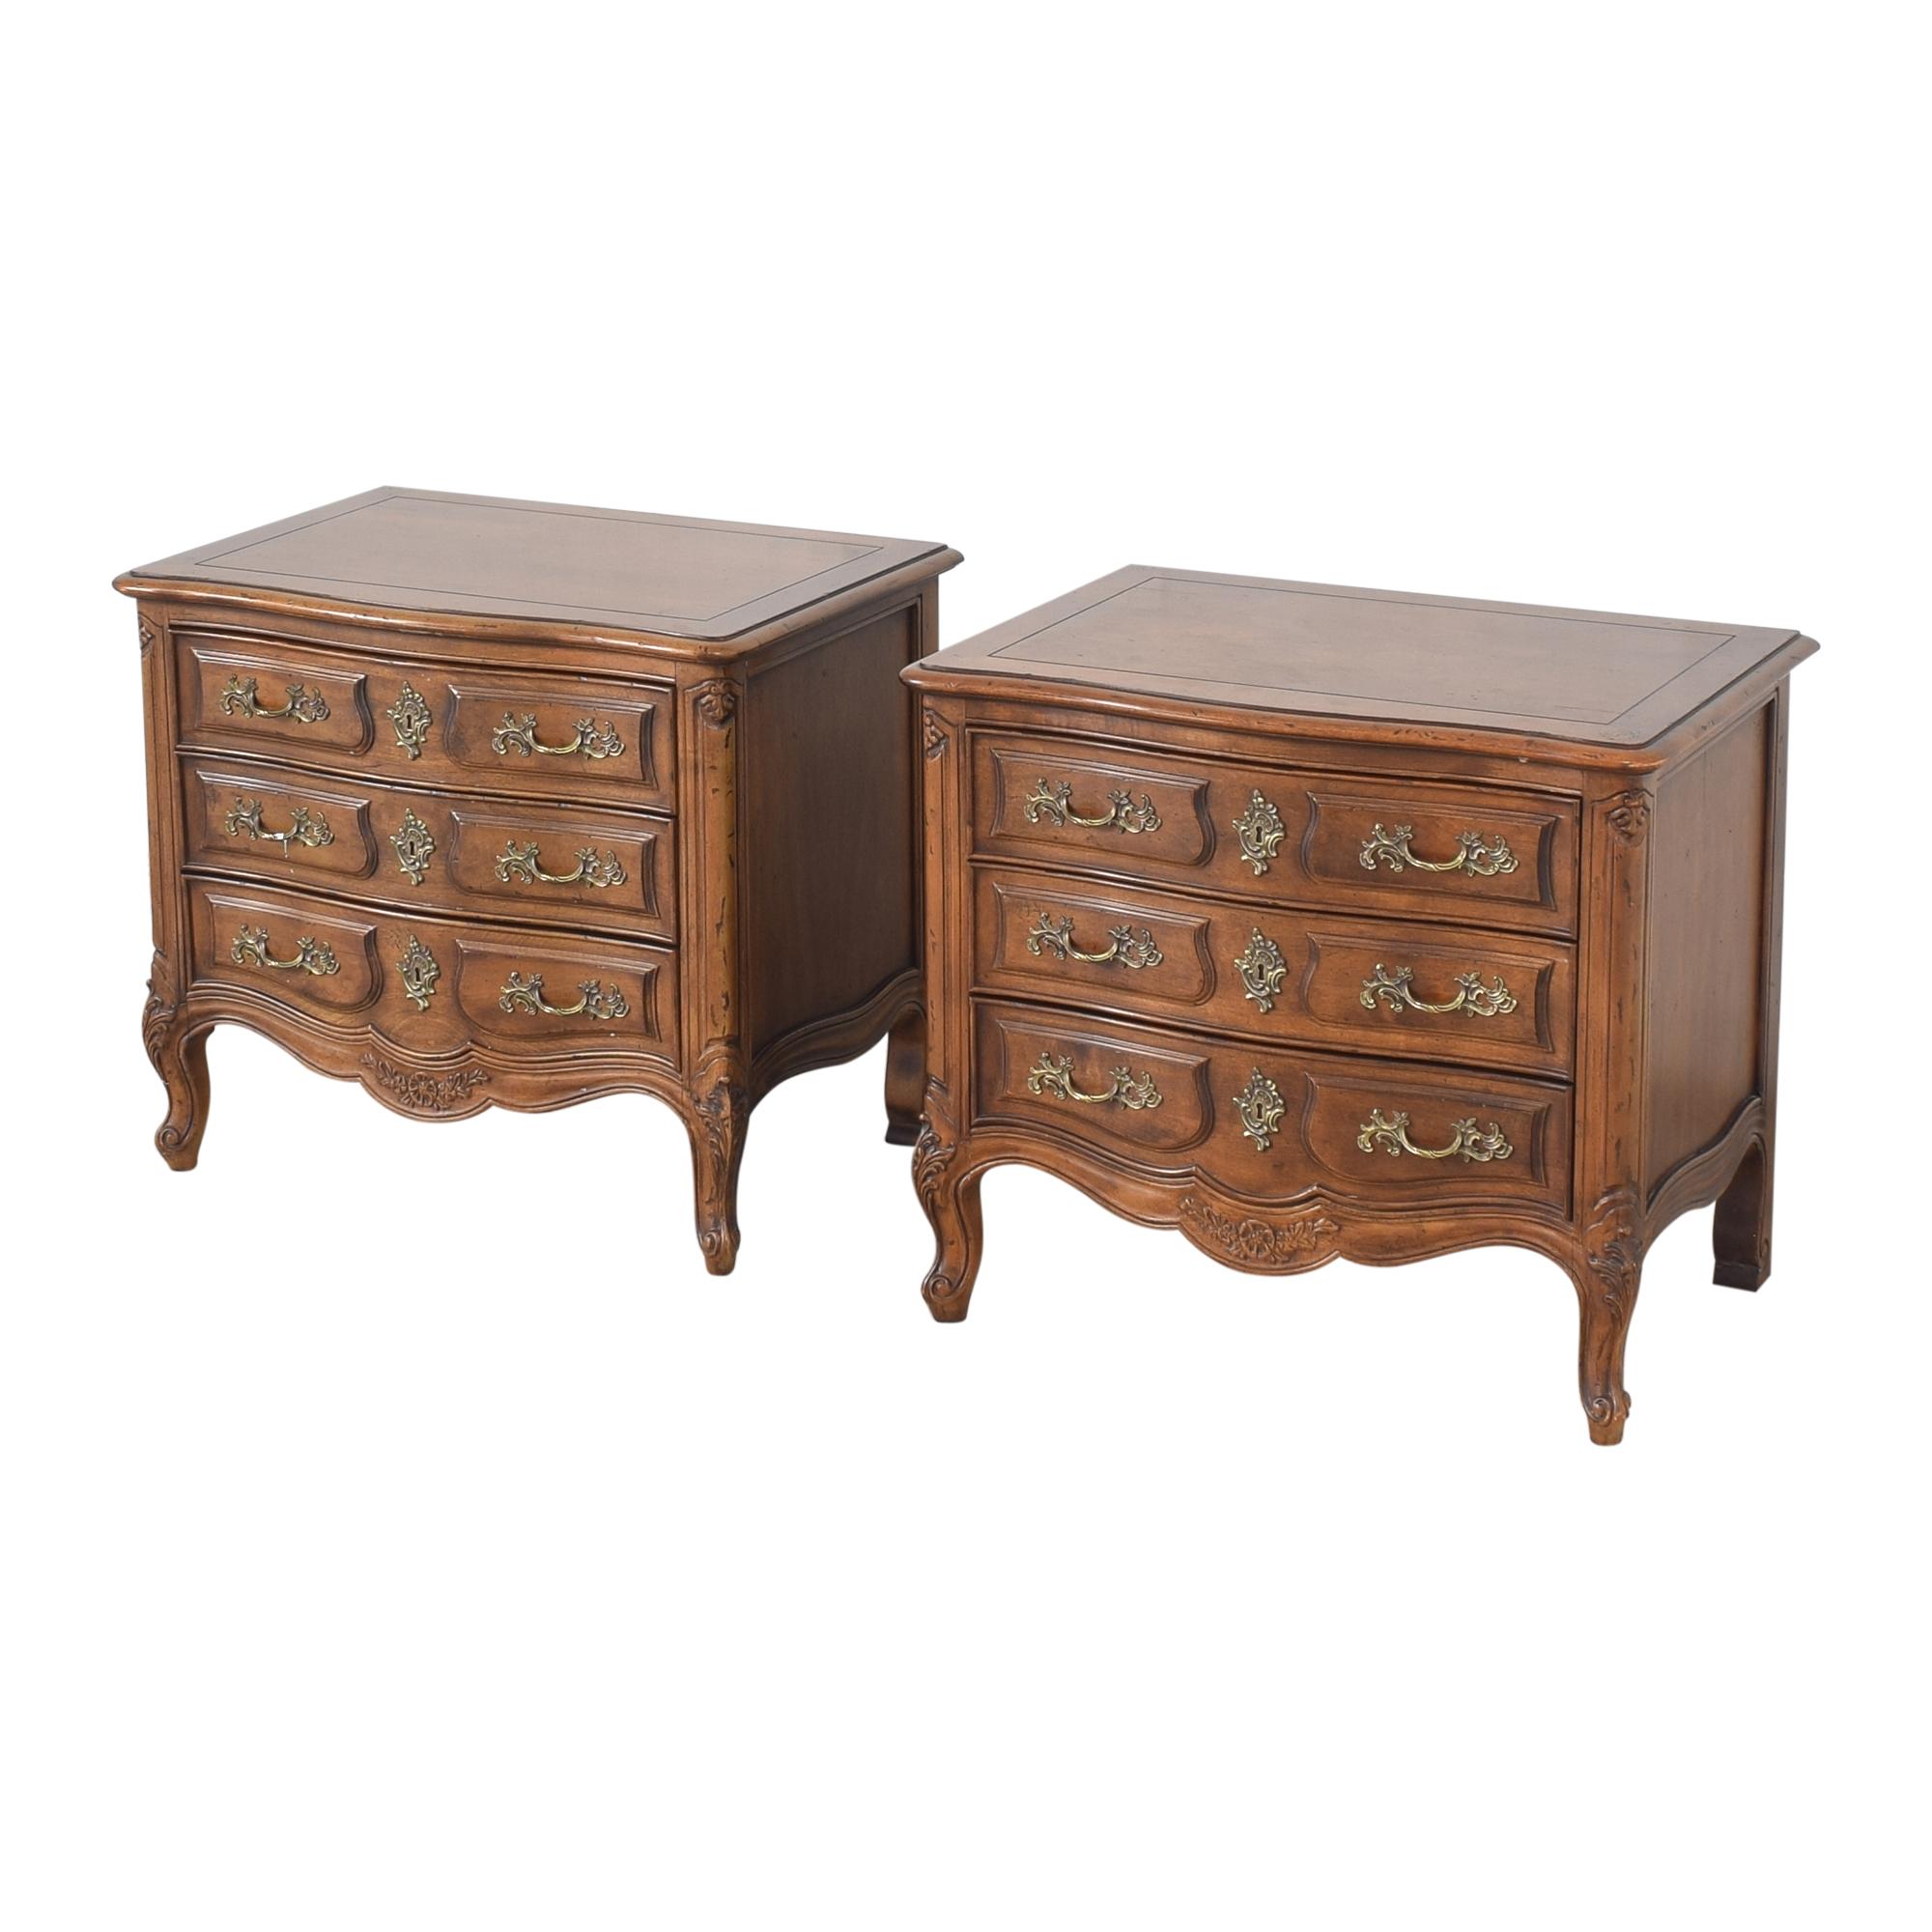 buy Henredon Furniture Villandry Collection Nightstands Henredon Furniture Tables